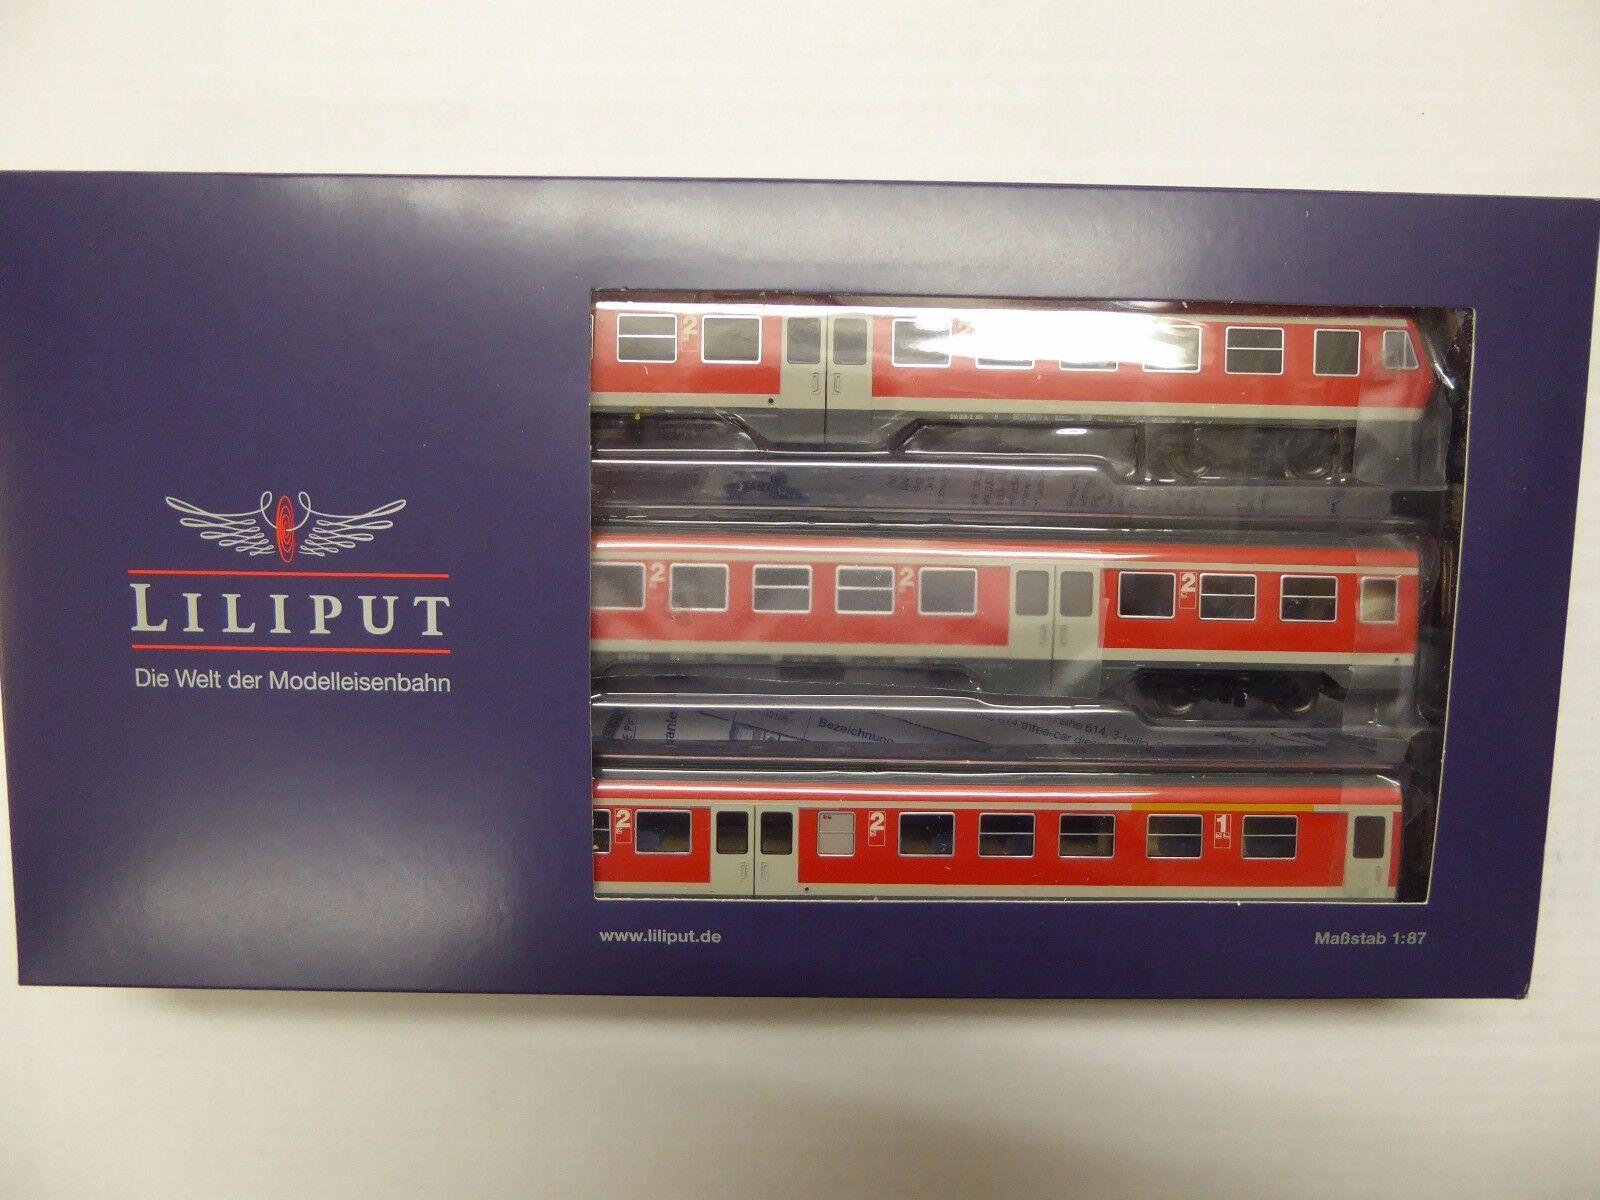 Liliput l133154 dieseltriebzug serie 614 914 3 piezas DB AG mercancía nueva